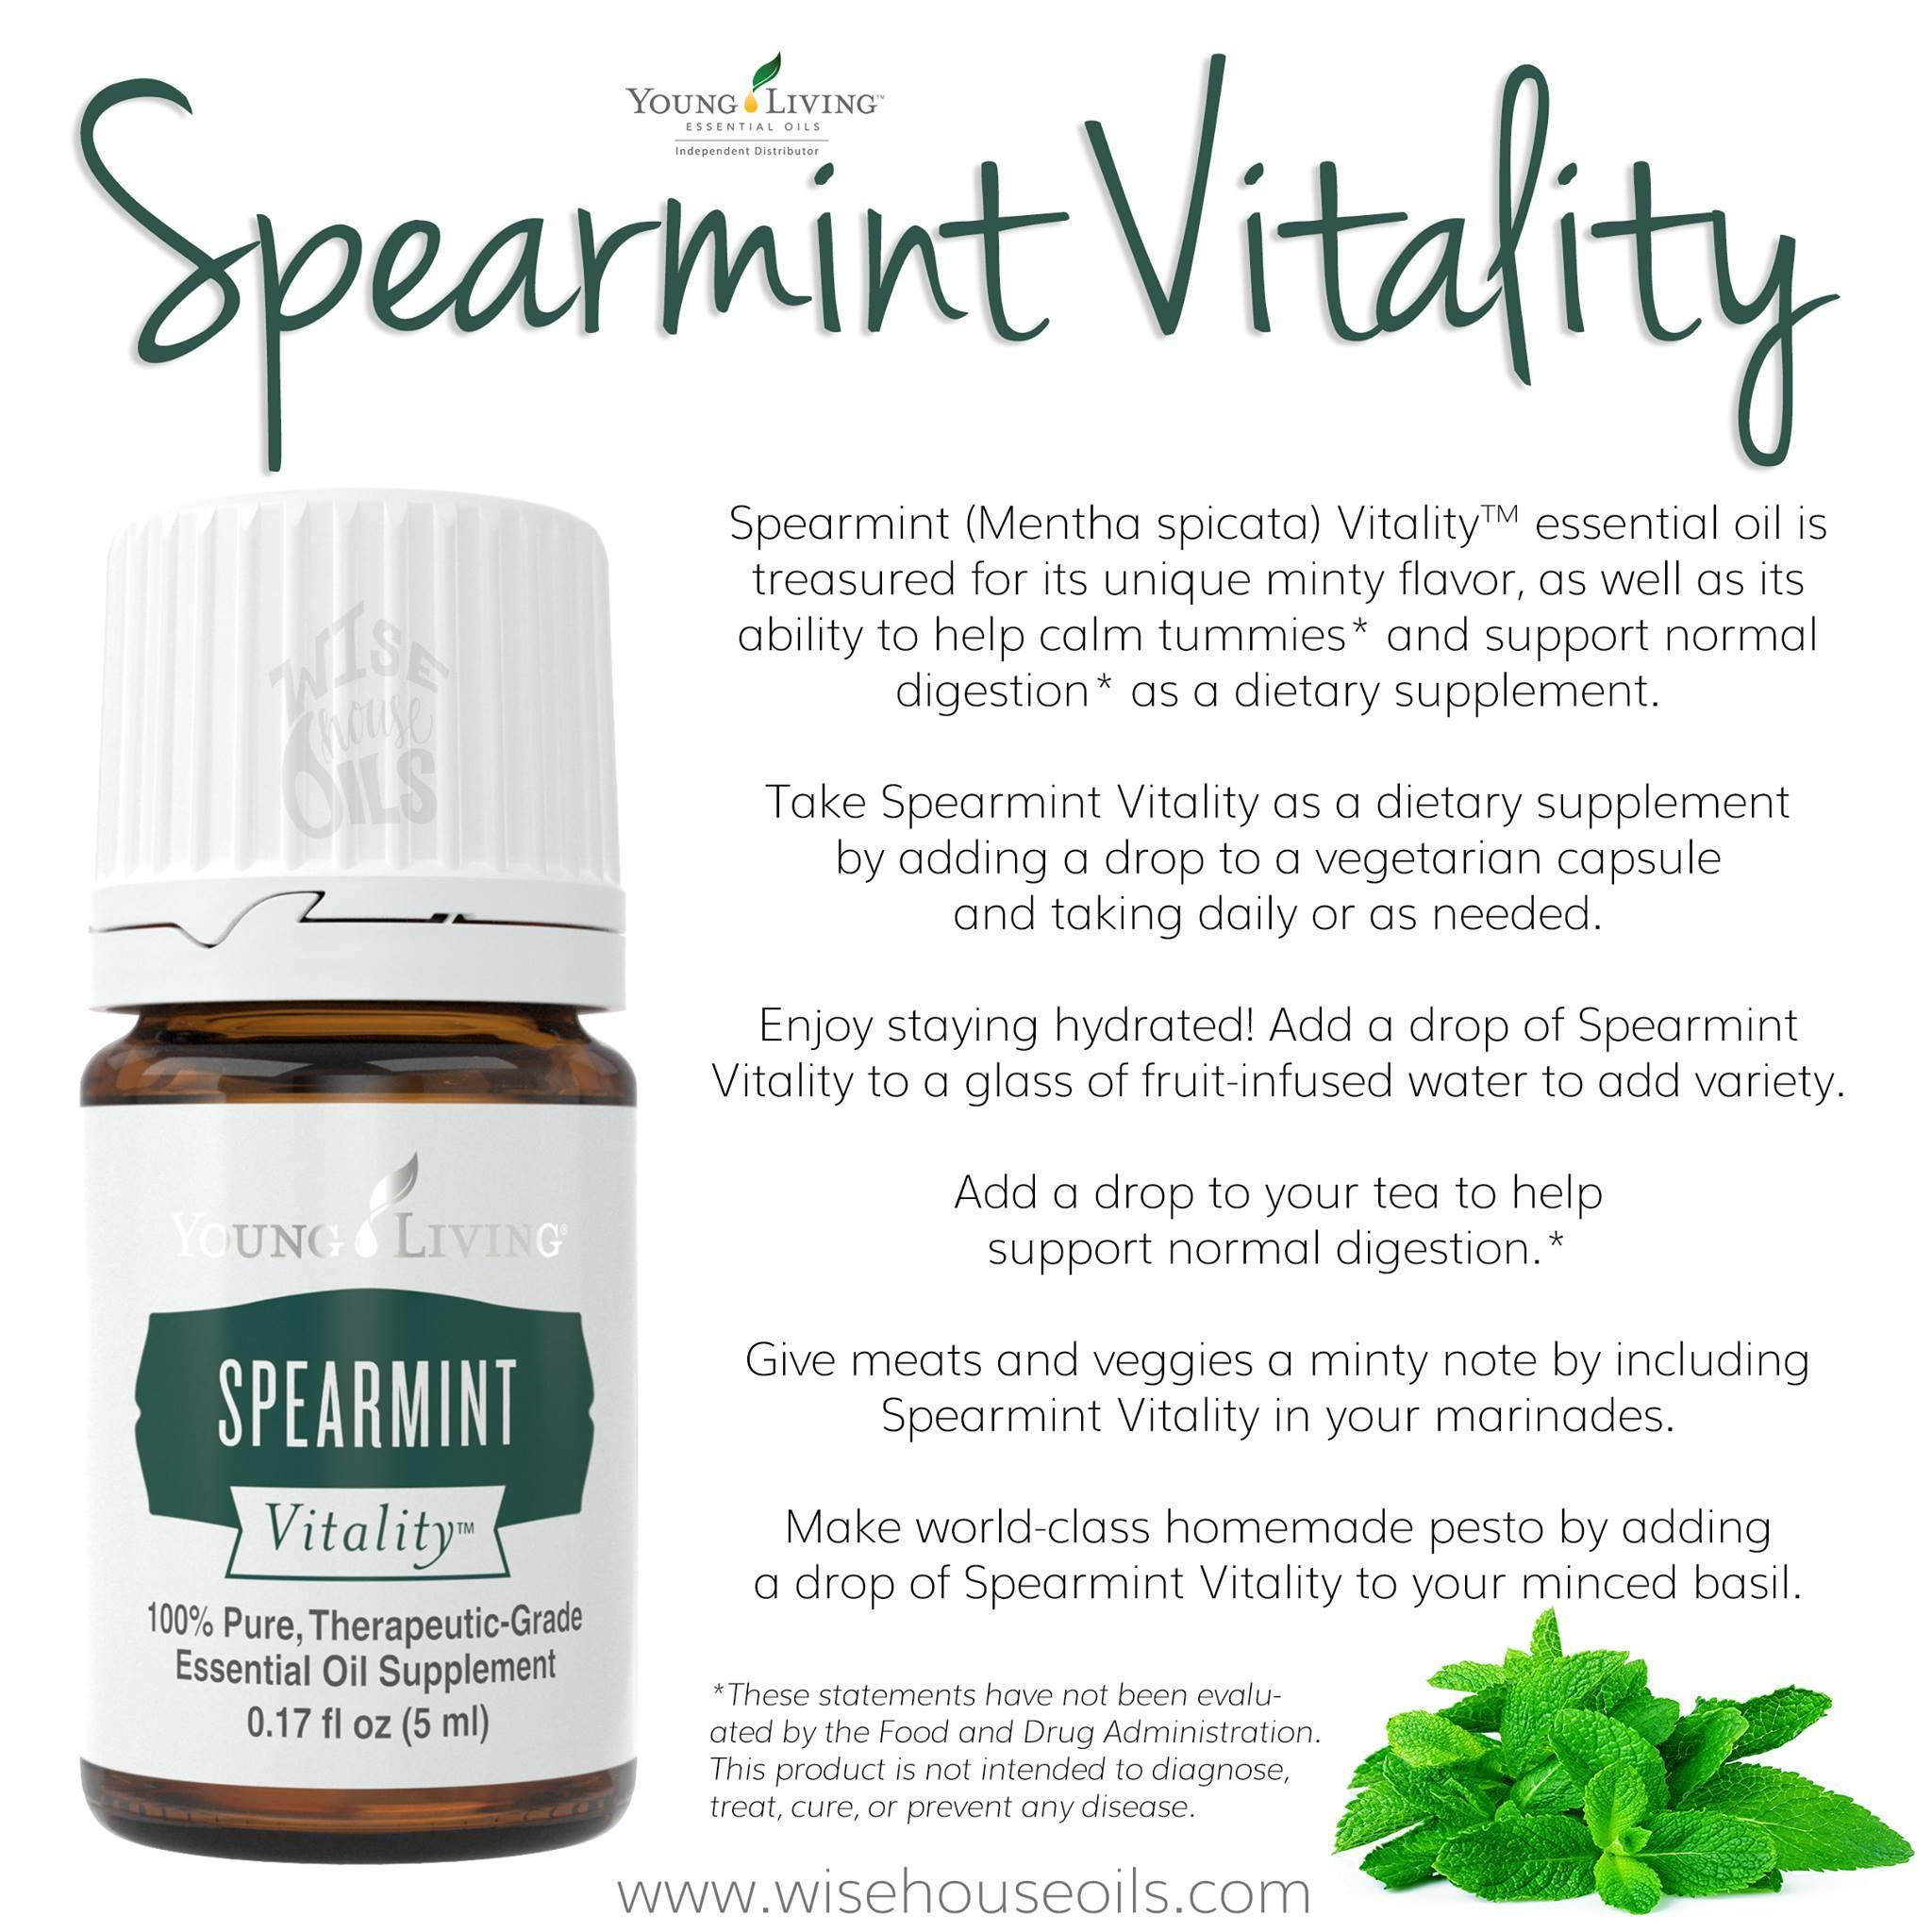 Spearmint vitality.jpg